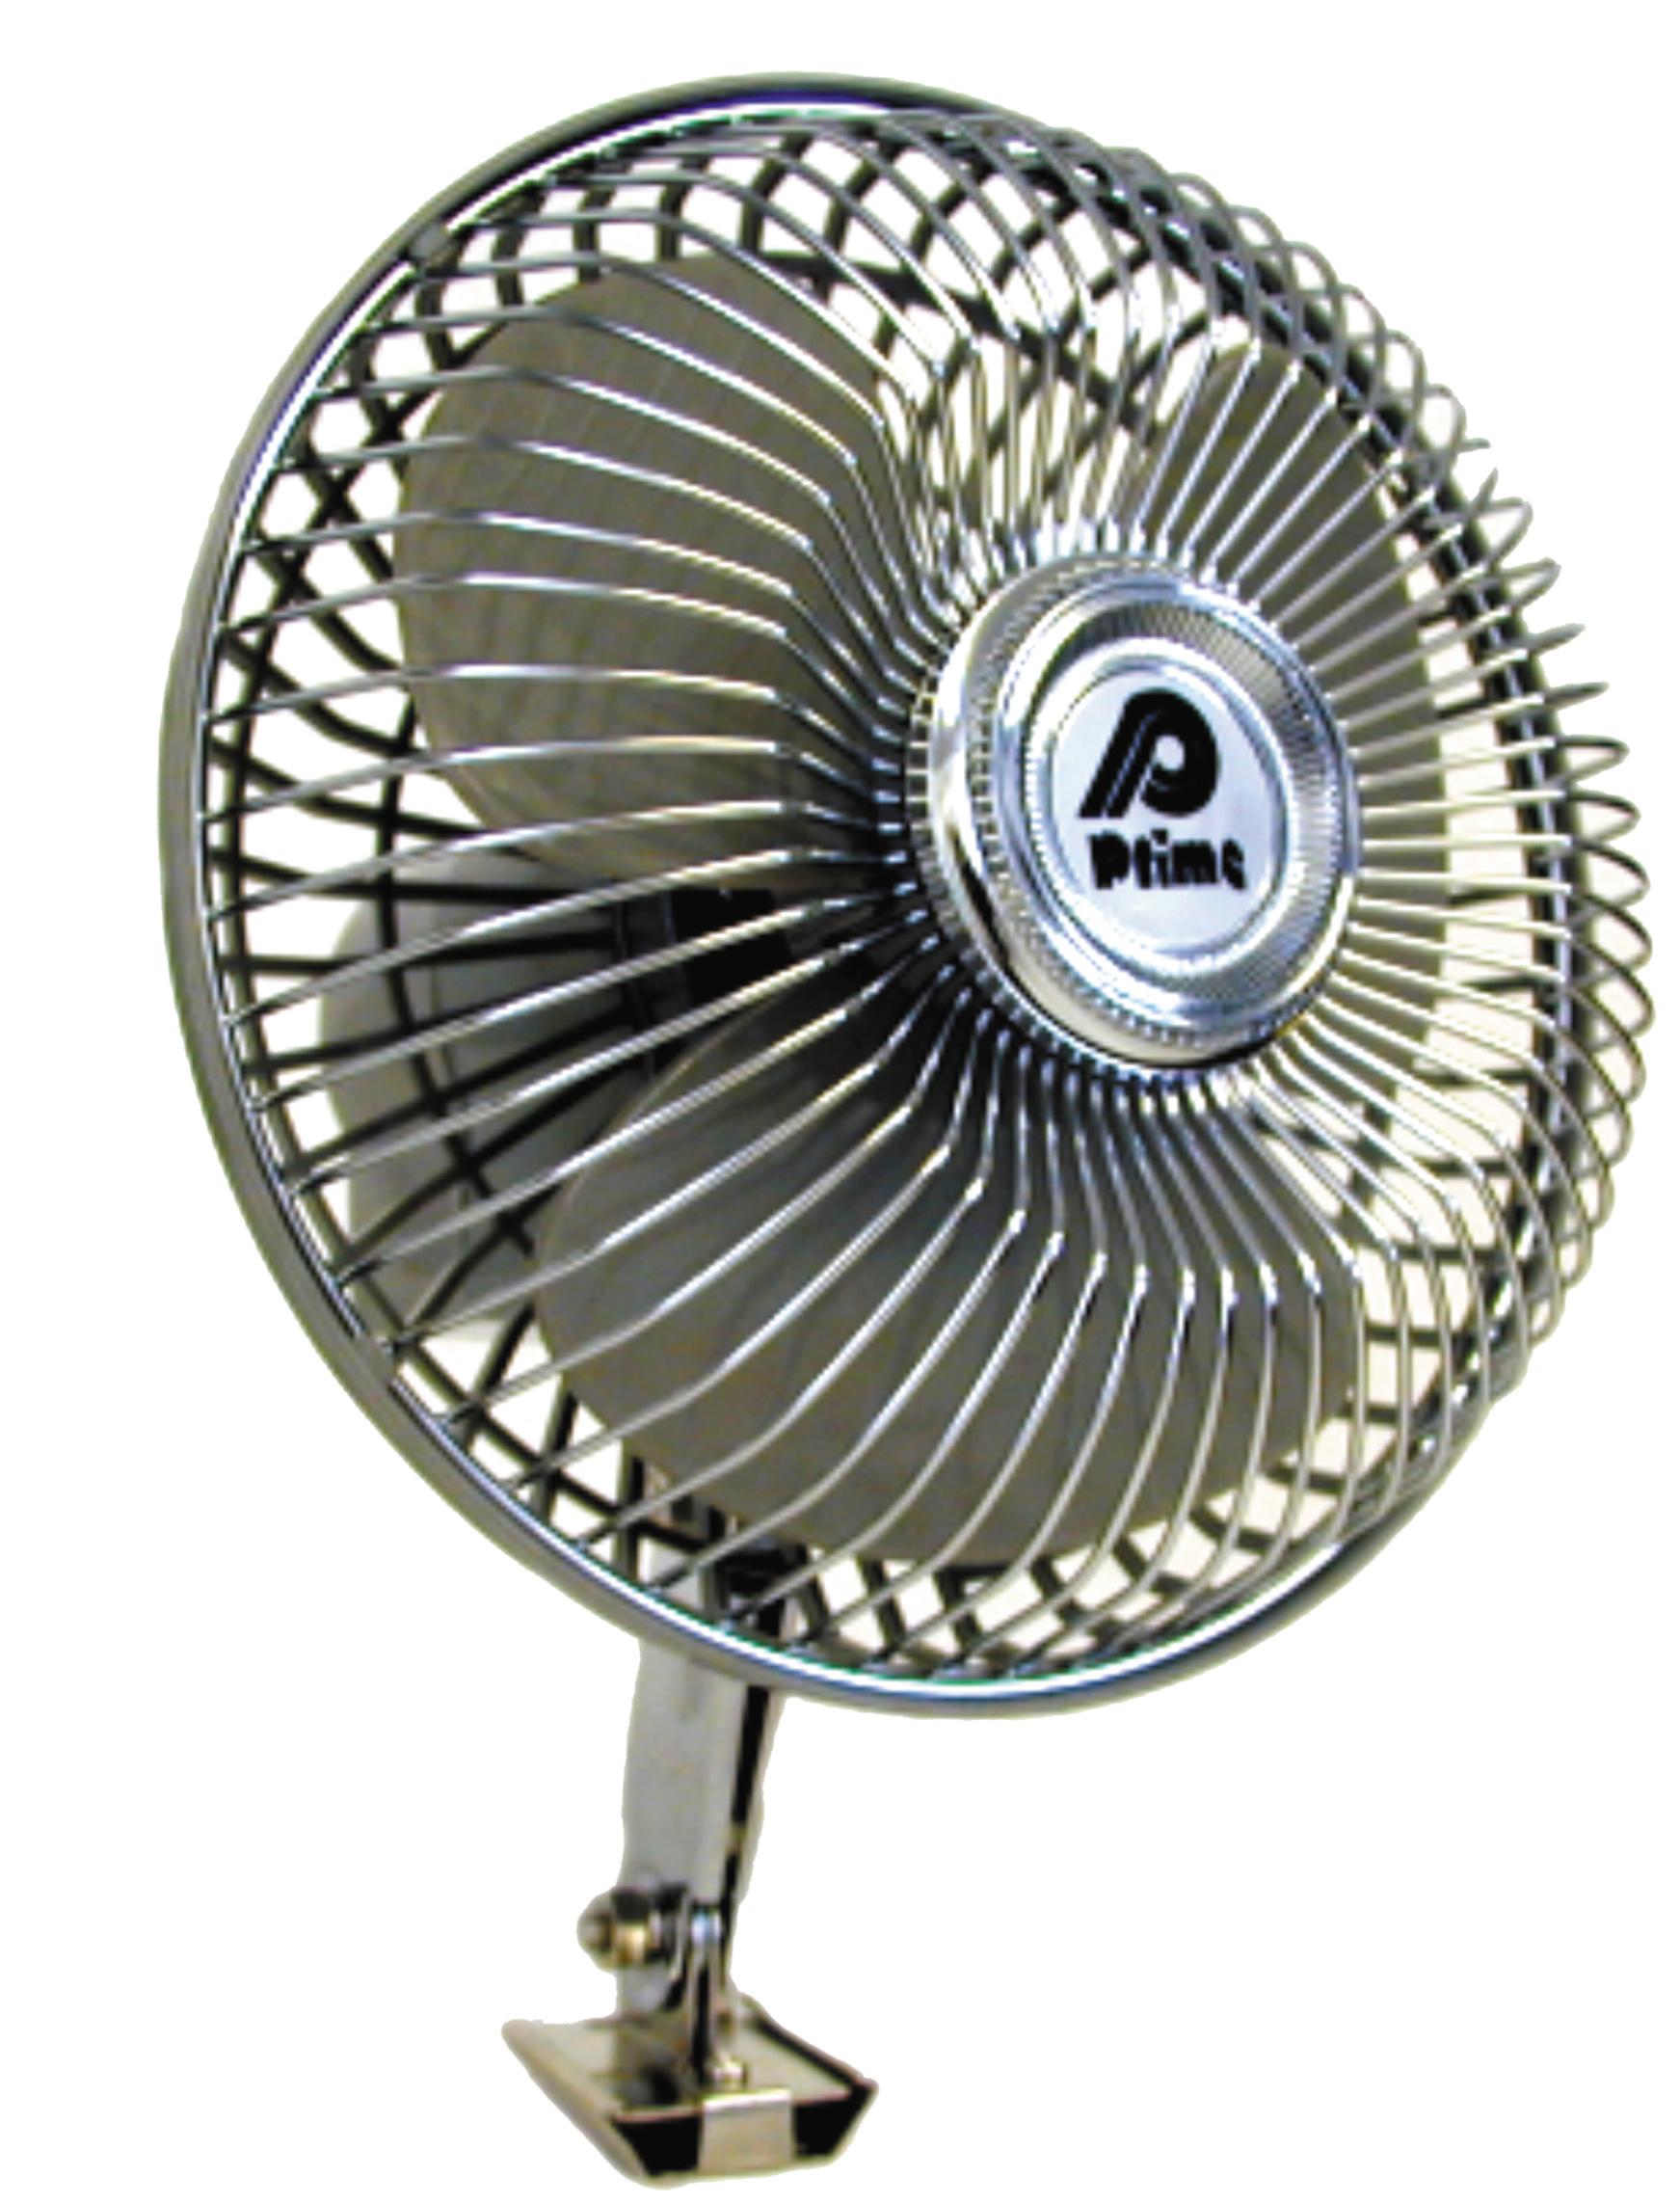 12 Volt Fans : Prime products volt oscillating fan